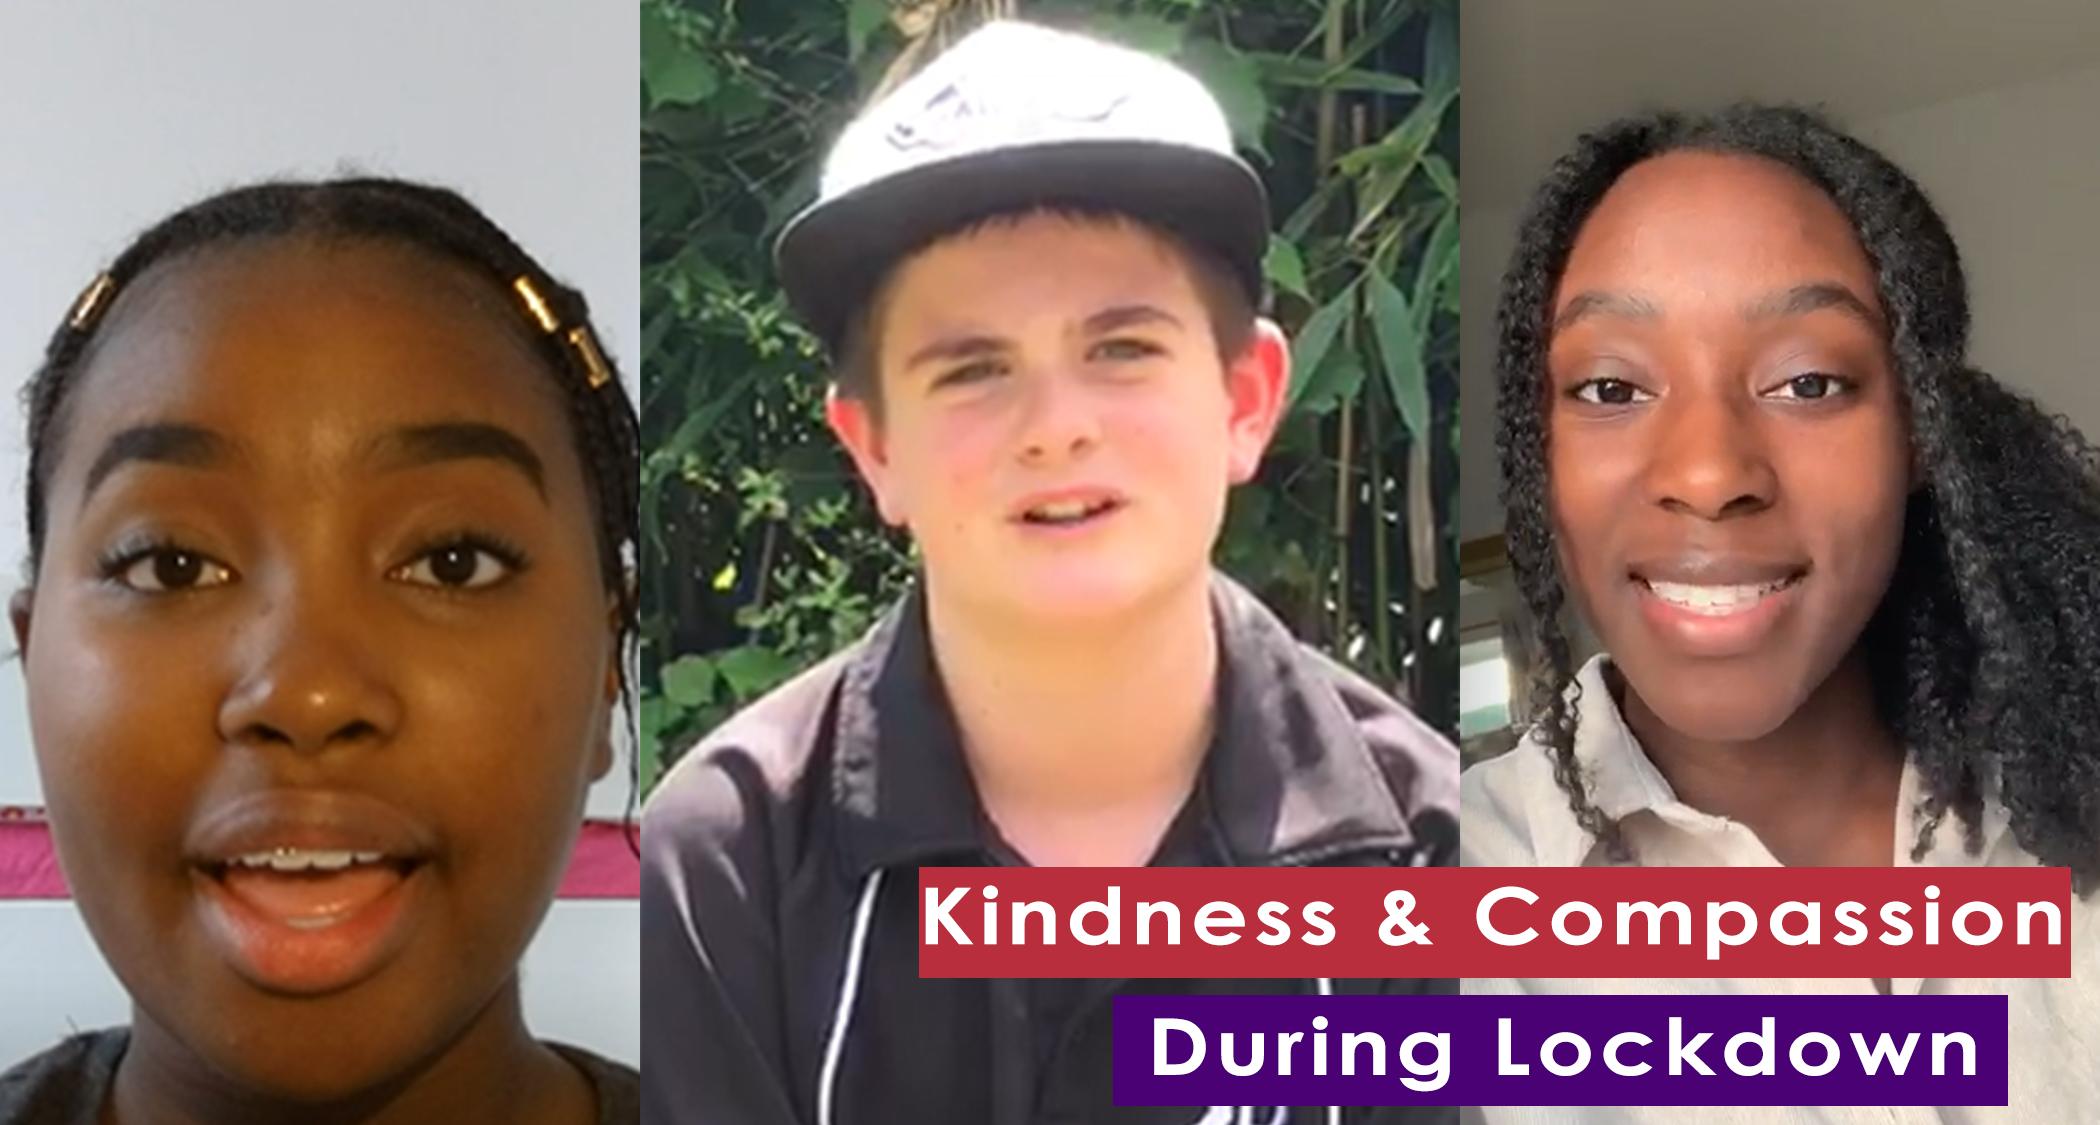 Pupils Show Kindness During Lockdown